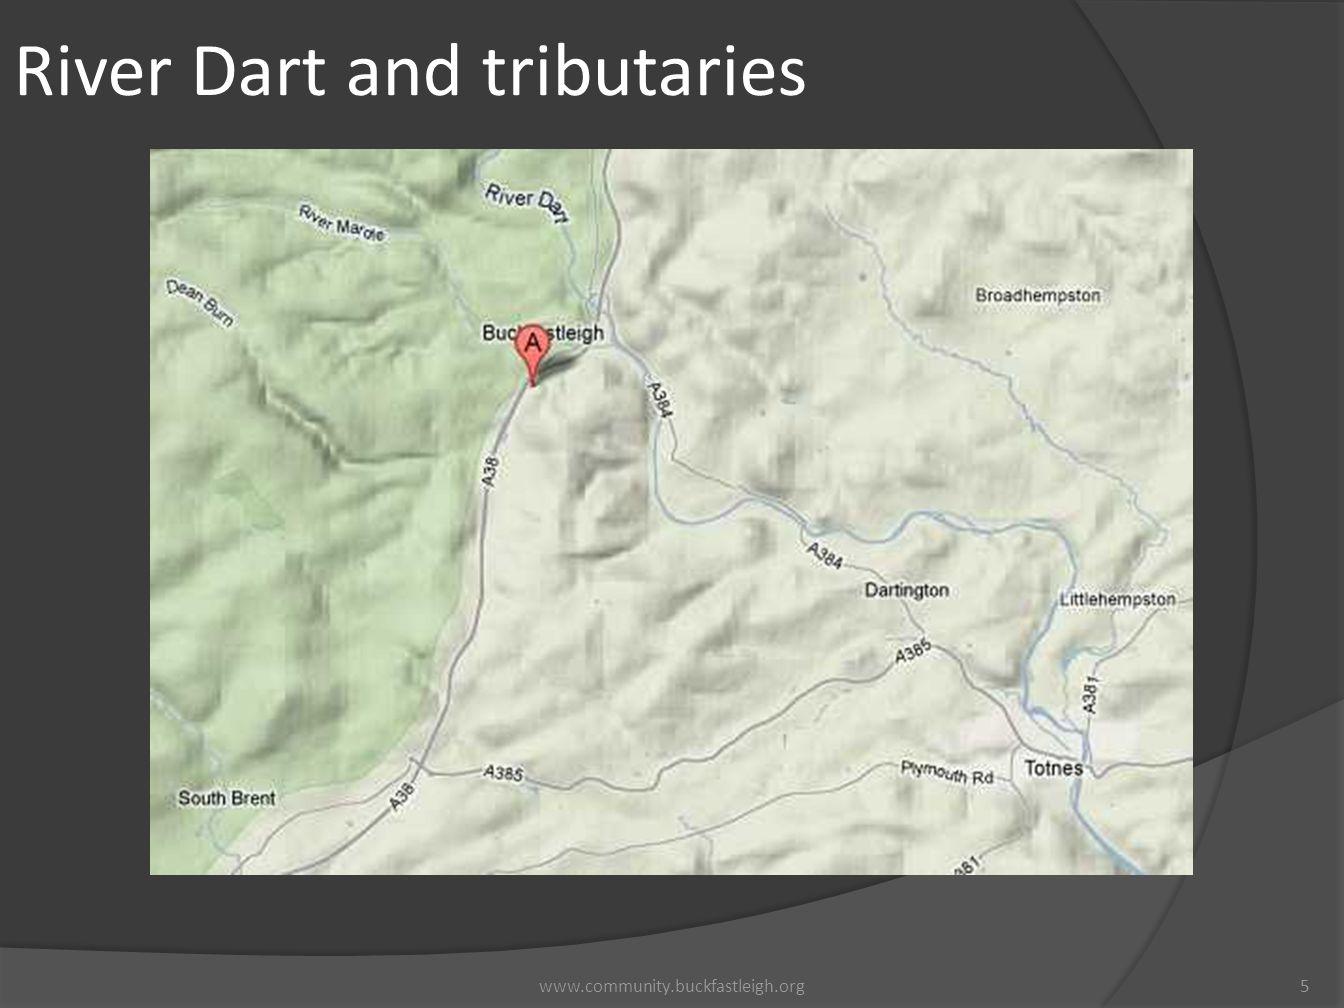 River Dart and tributaries